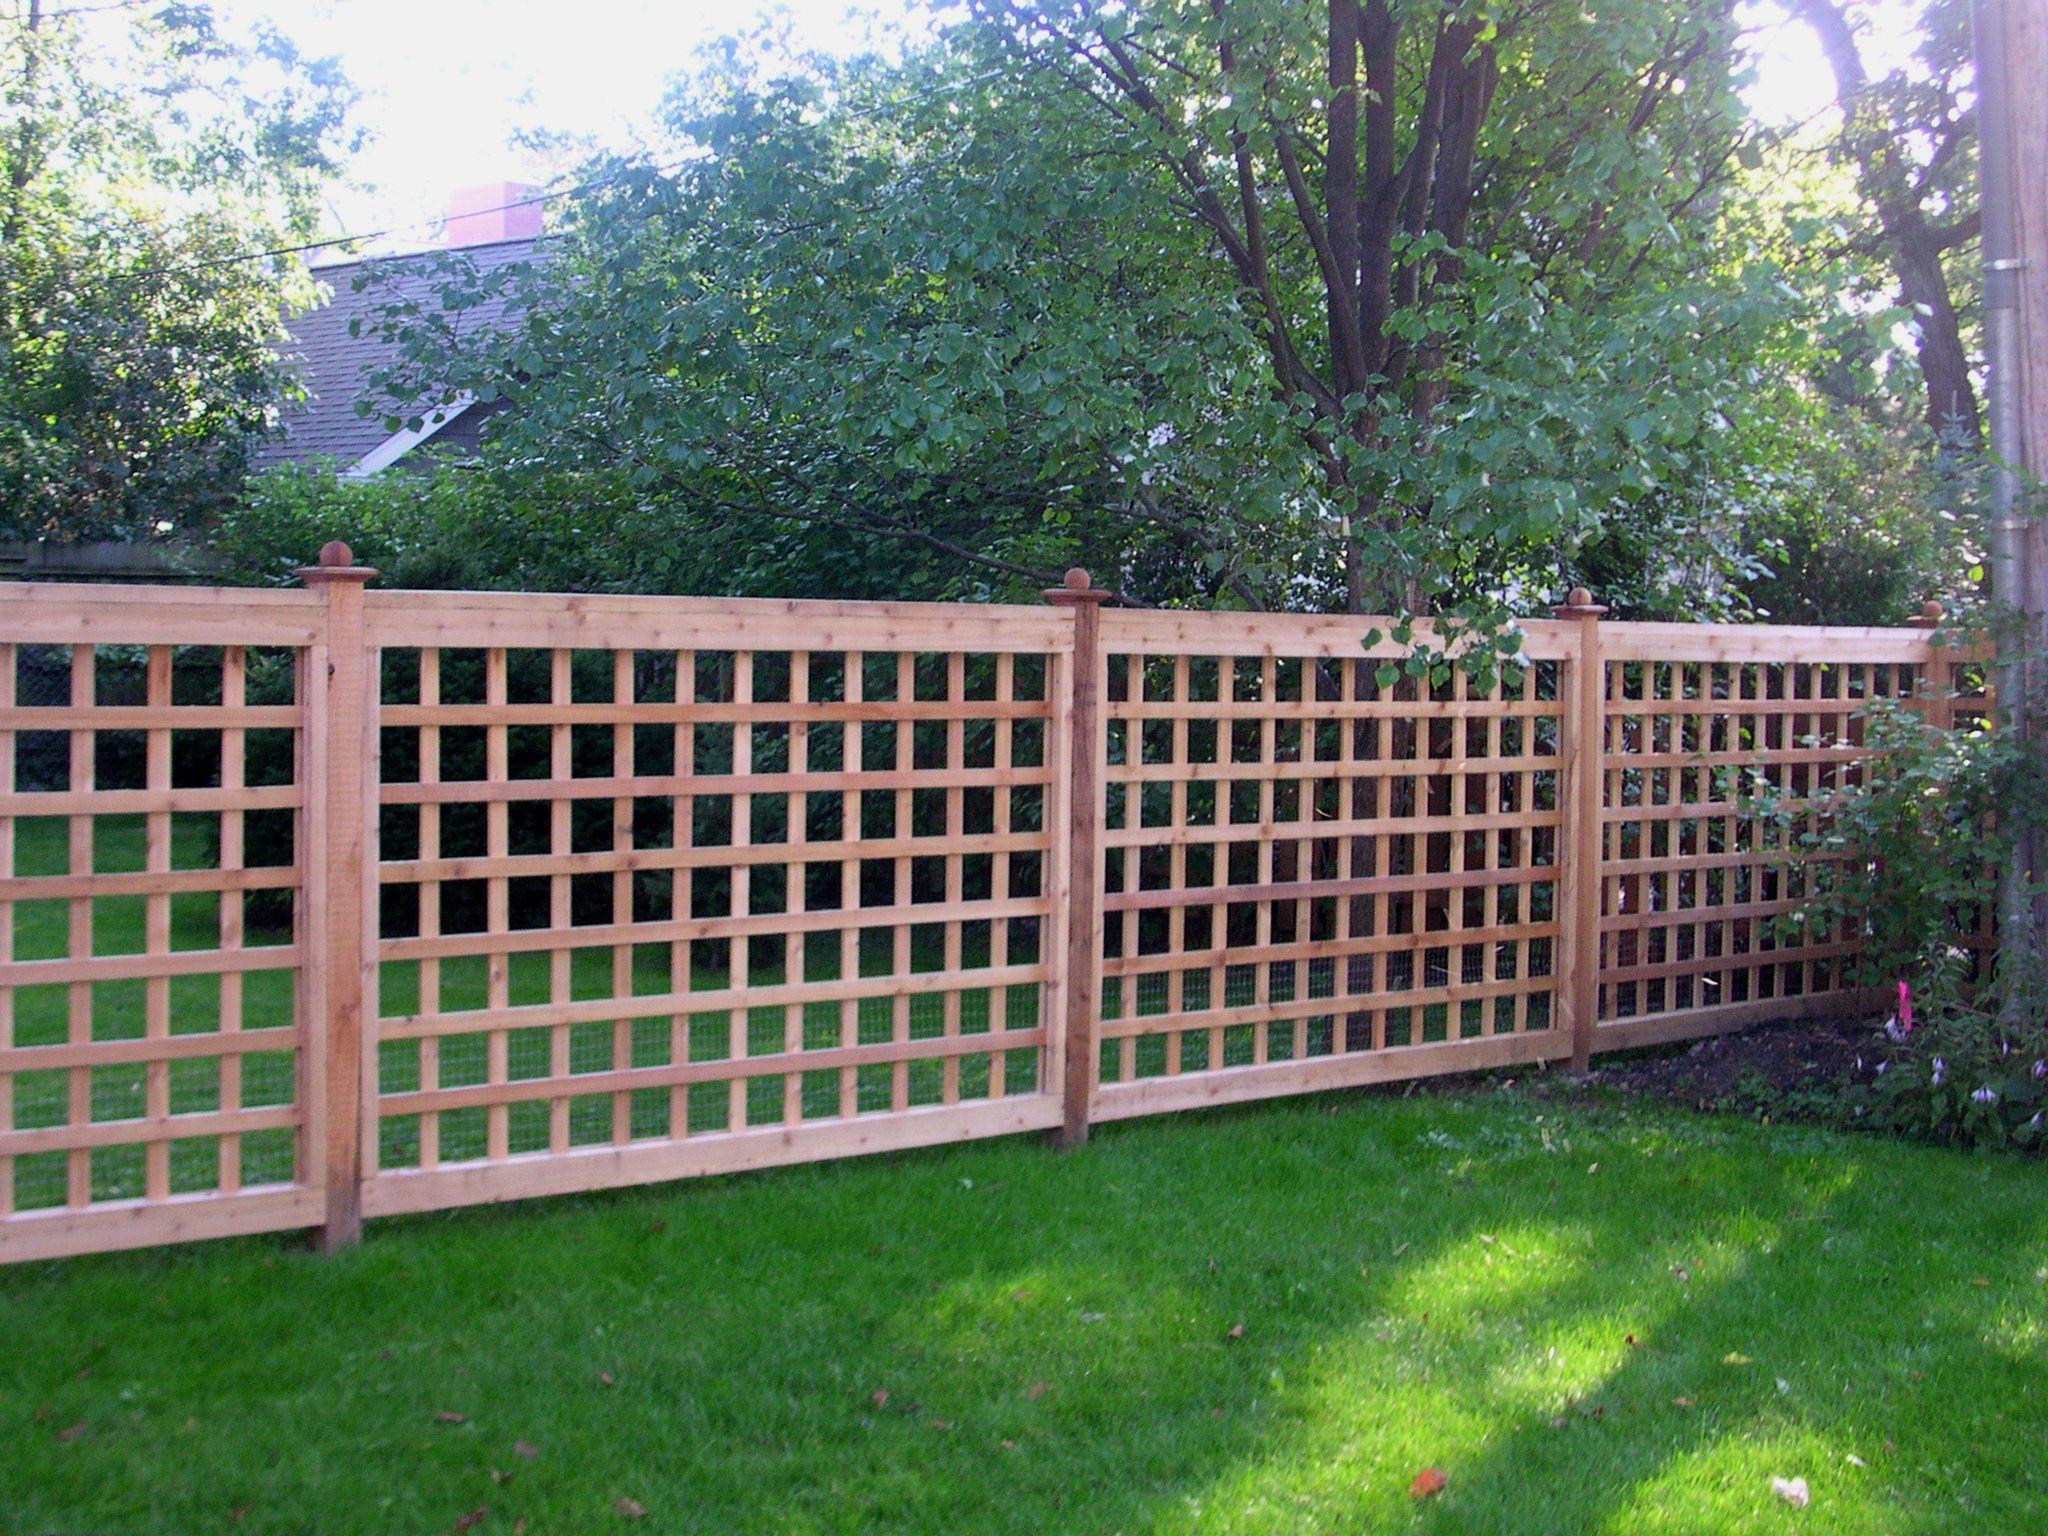 21 Home Fence Design Ideas Privacy Fence Designs Fence Design Lattice Fence Panels